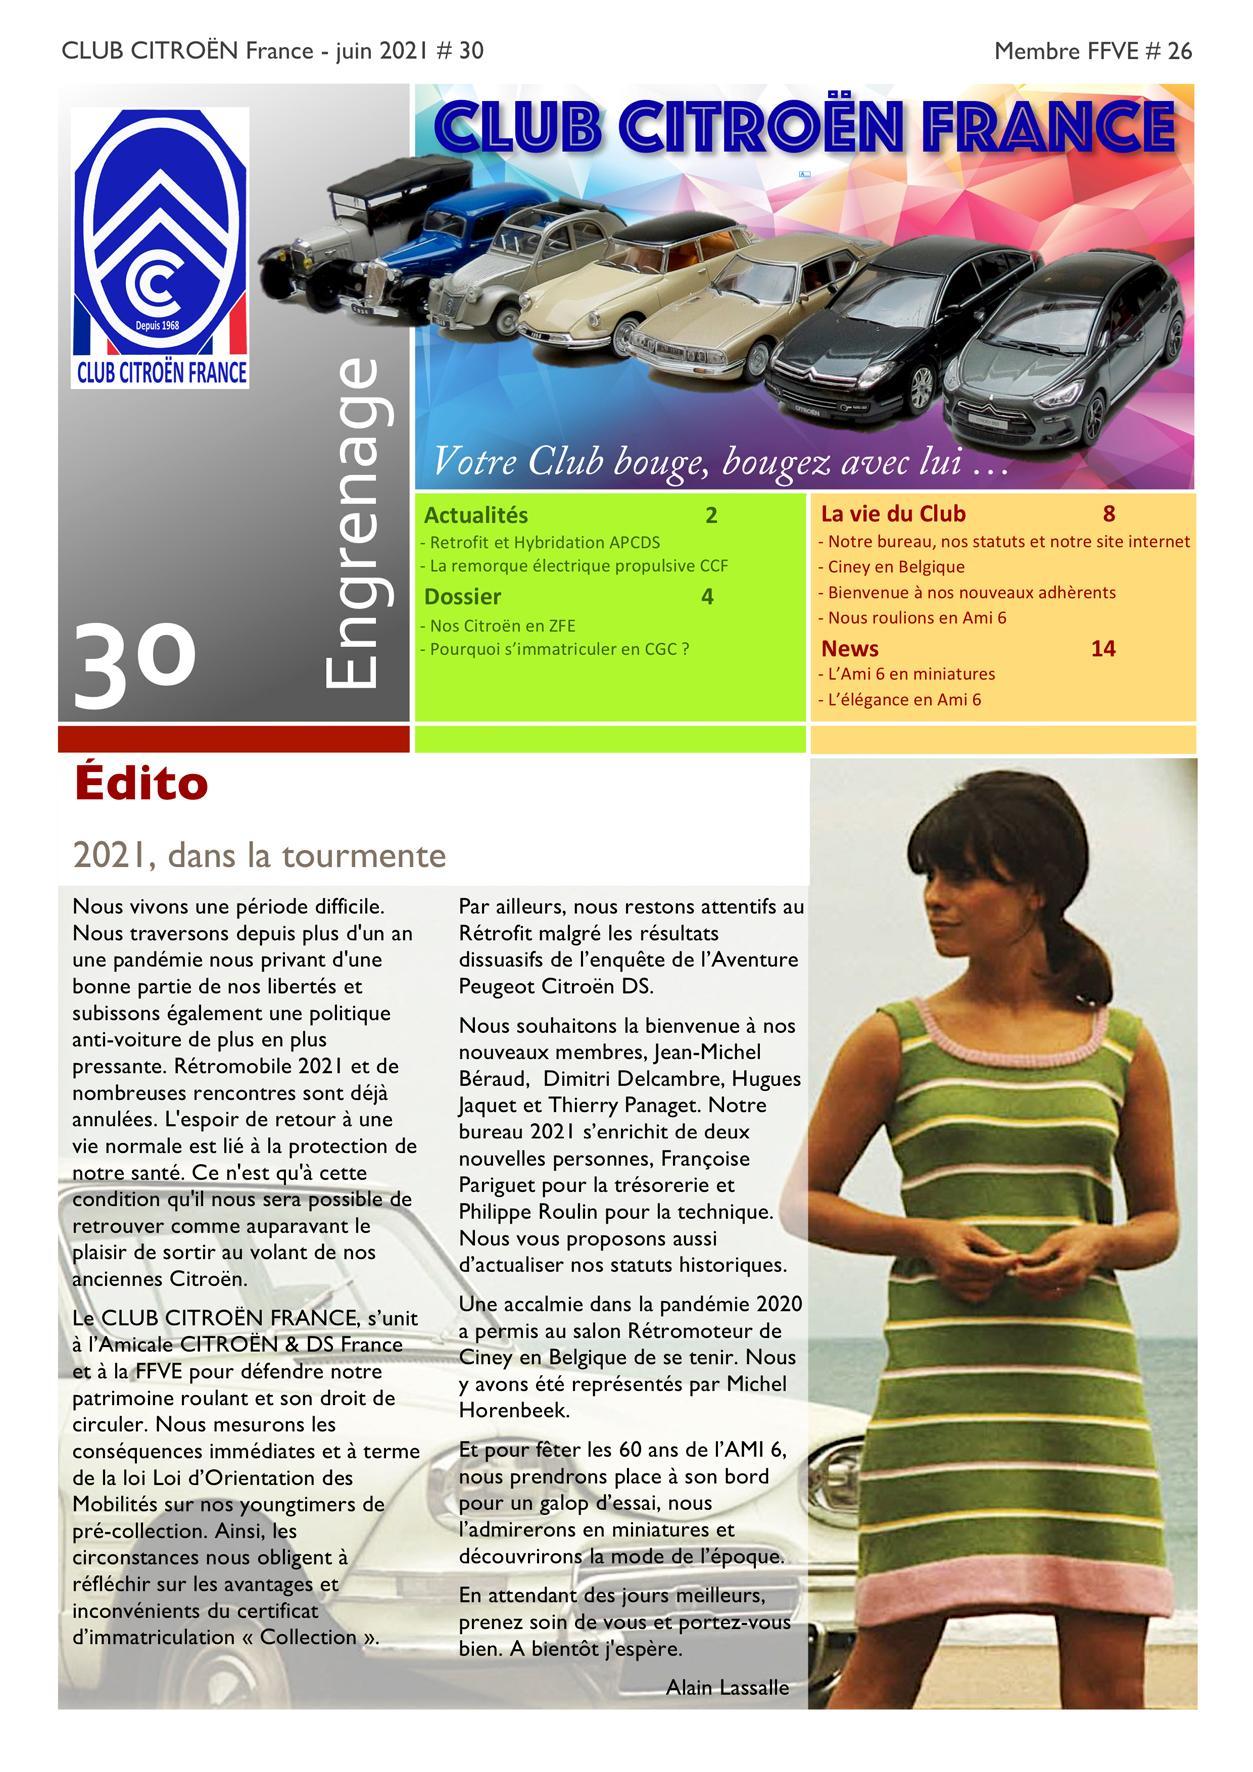 News engrenage 30 m7 p01